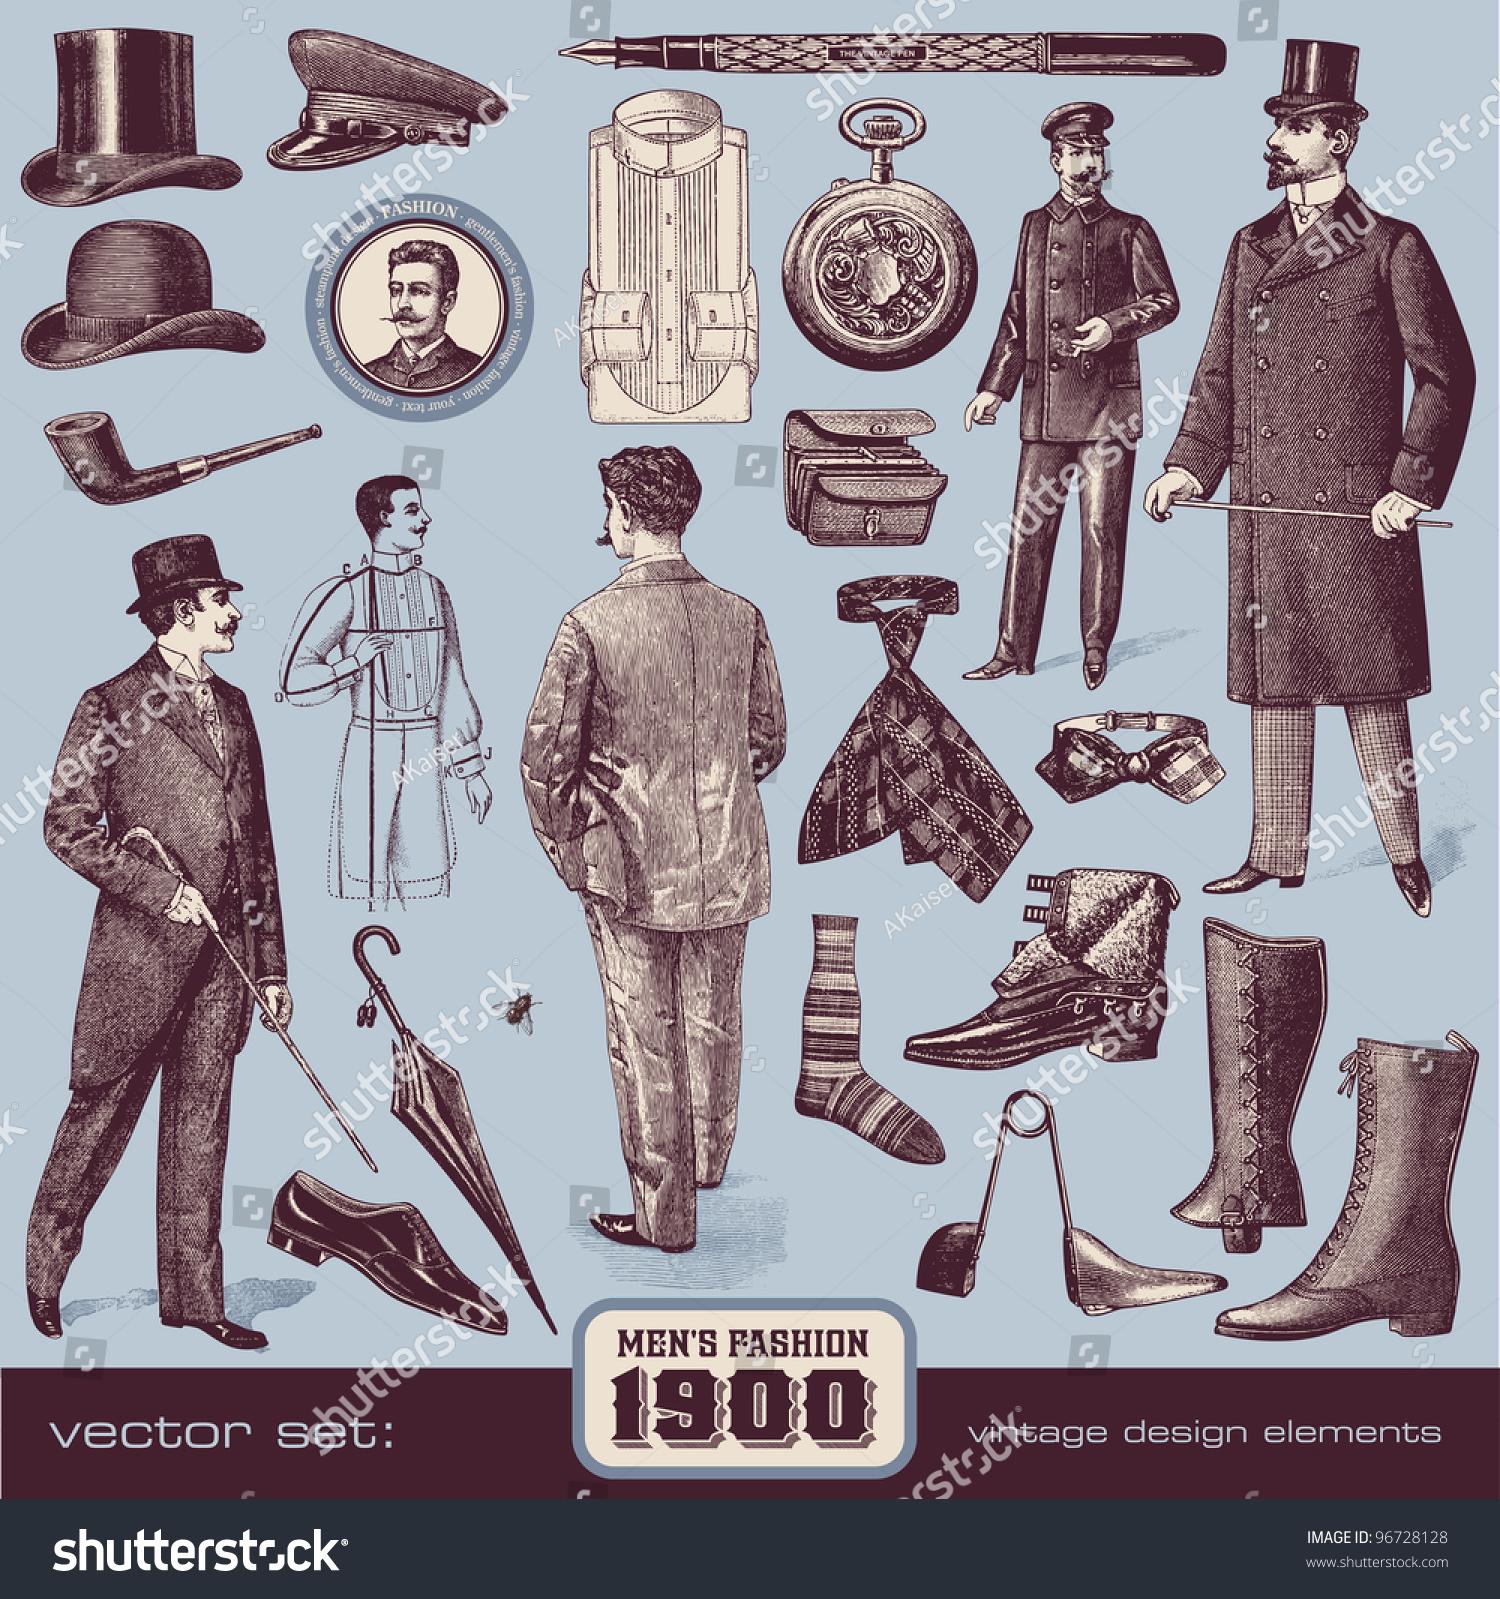 Gentlemen 'S Fashion And Accessories (1900) Stock Vector